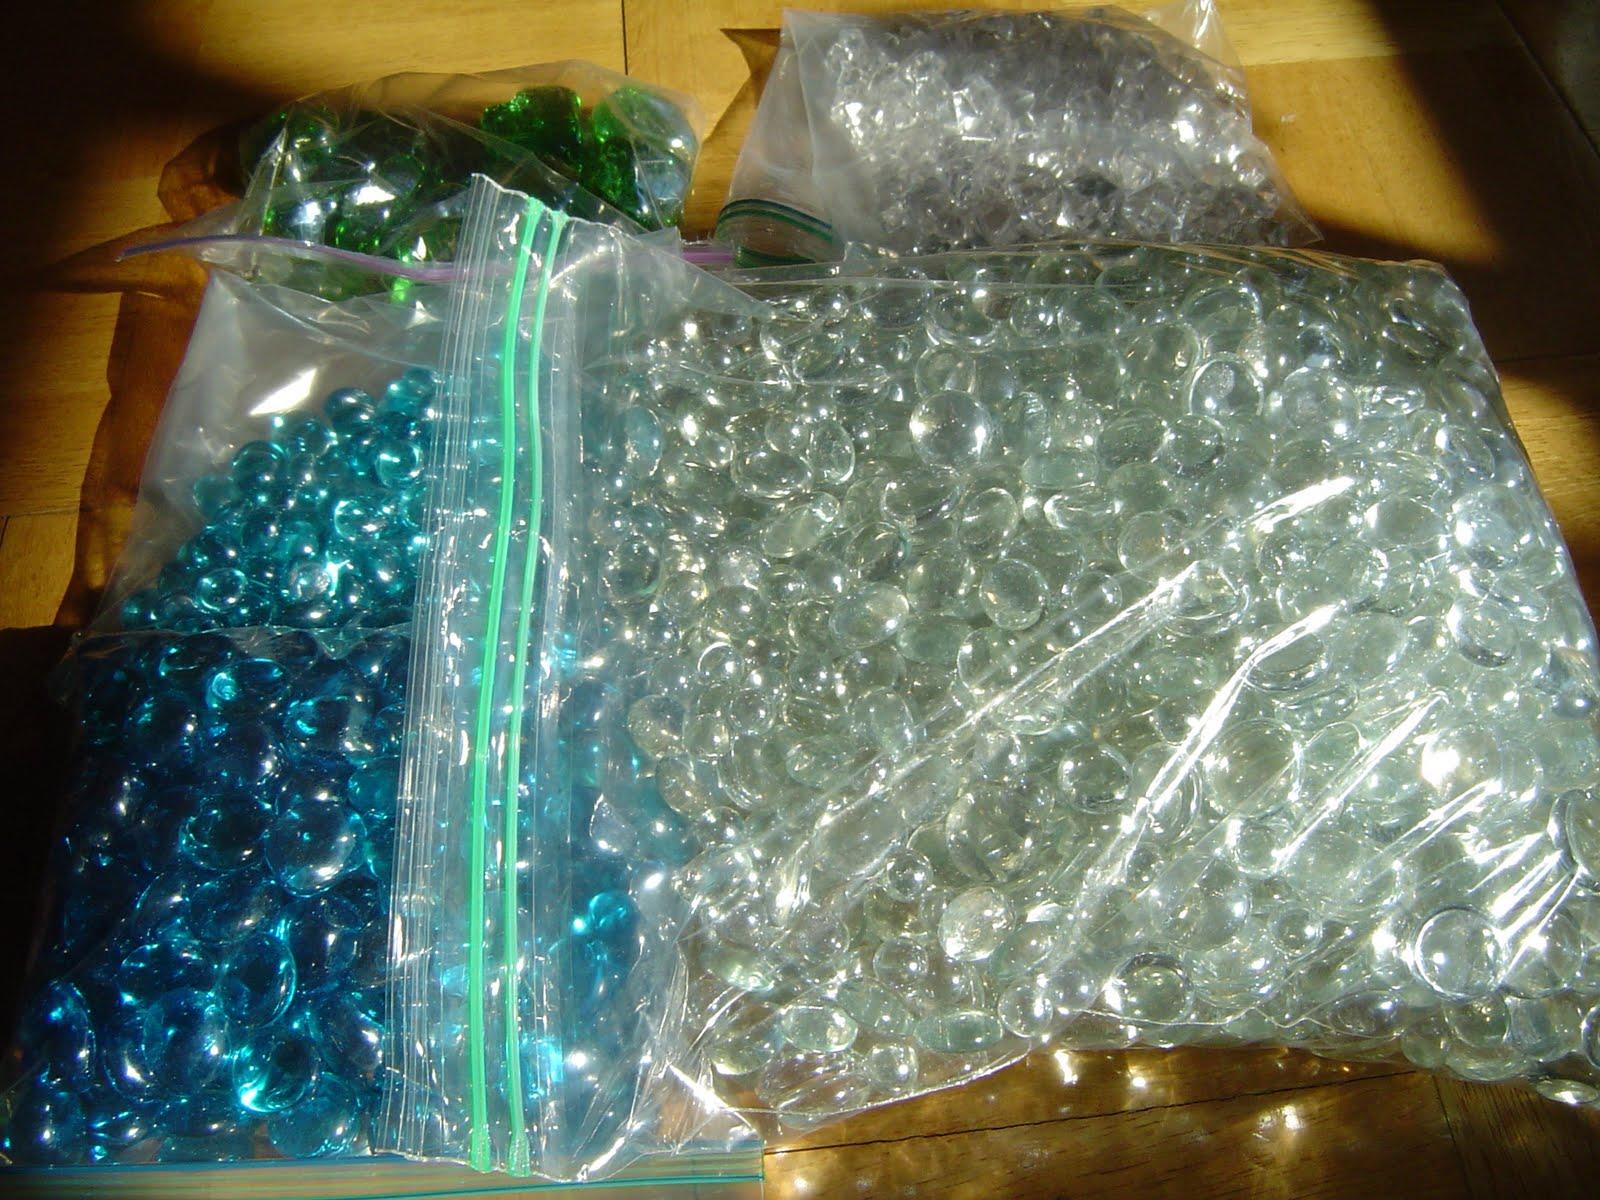 DIY TIFFANY BLUE WEDDING Filler Stones For Centerpieces